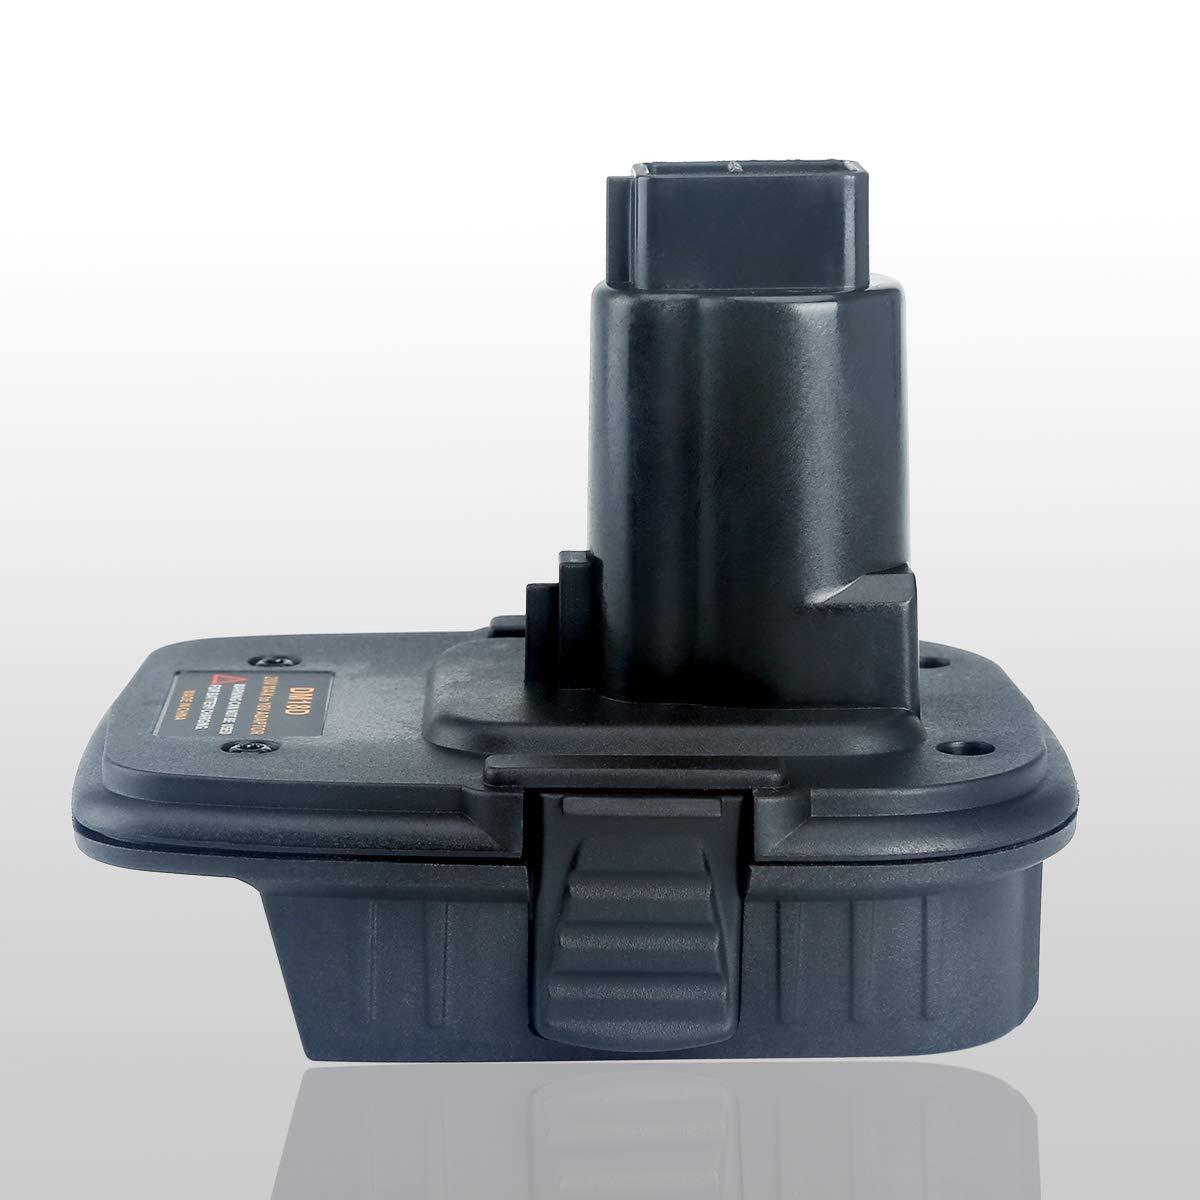 Lasica 20V Battery Adapter DCA1820 with USB port for Dewalt 18V Tools, Convert Milwaukee 18V Lithium Battery M18 DeWalt MAX 20Volt Lithium-Ion Battery DCB204 to DeWalt 18V NiCad NiMh Battery DC9096 by Lasica (Image #8)